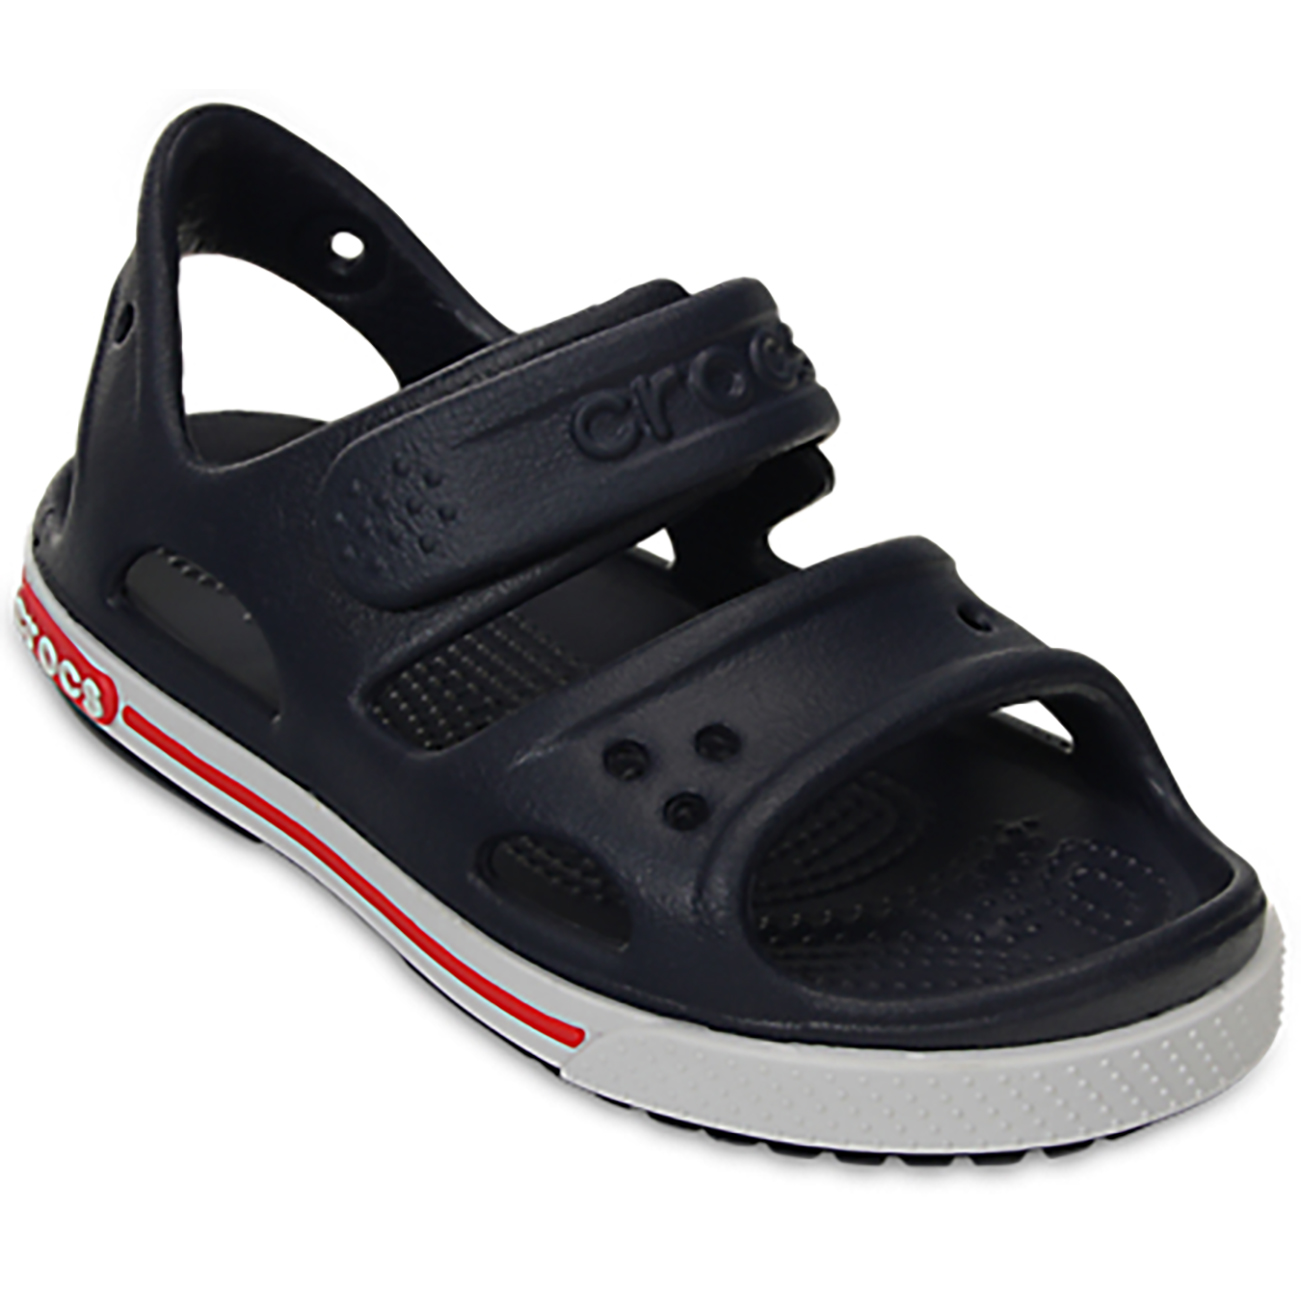 Unisex Kids Crocs Crocband II Sandal